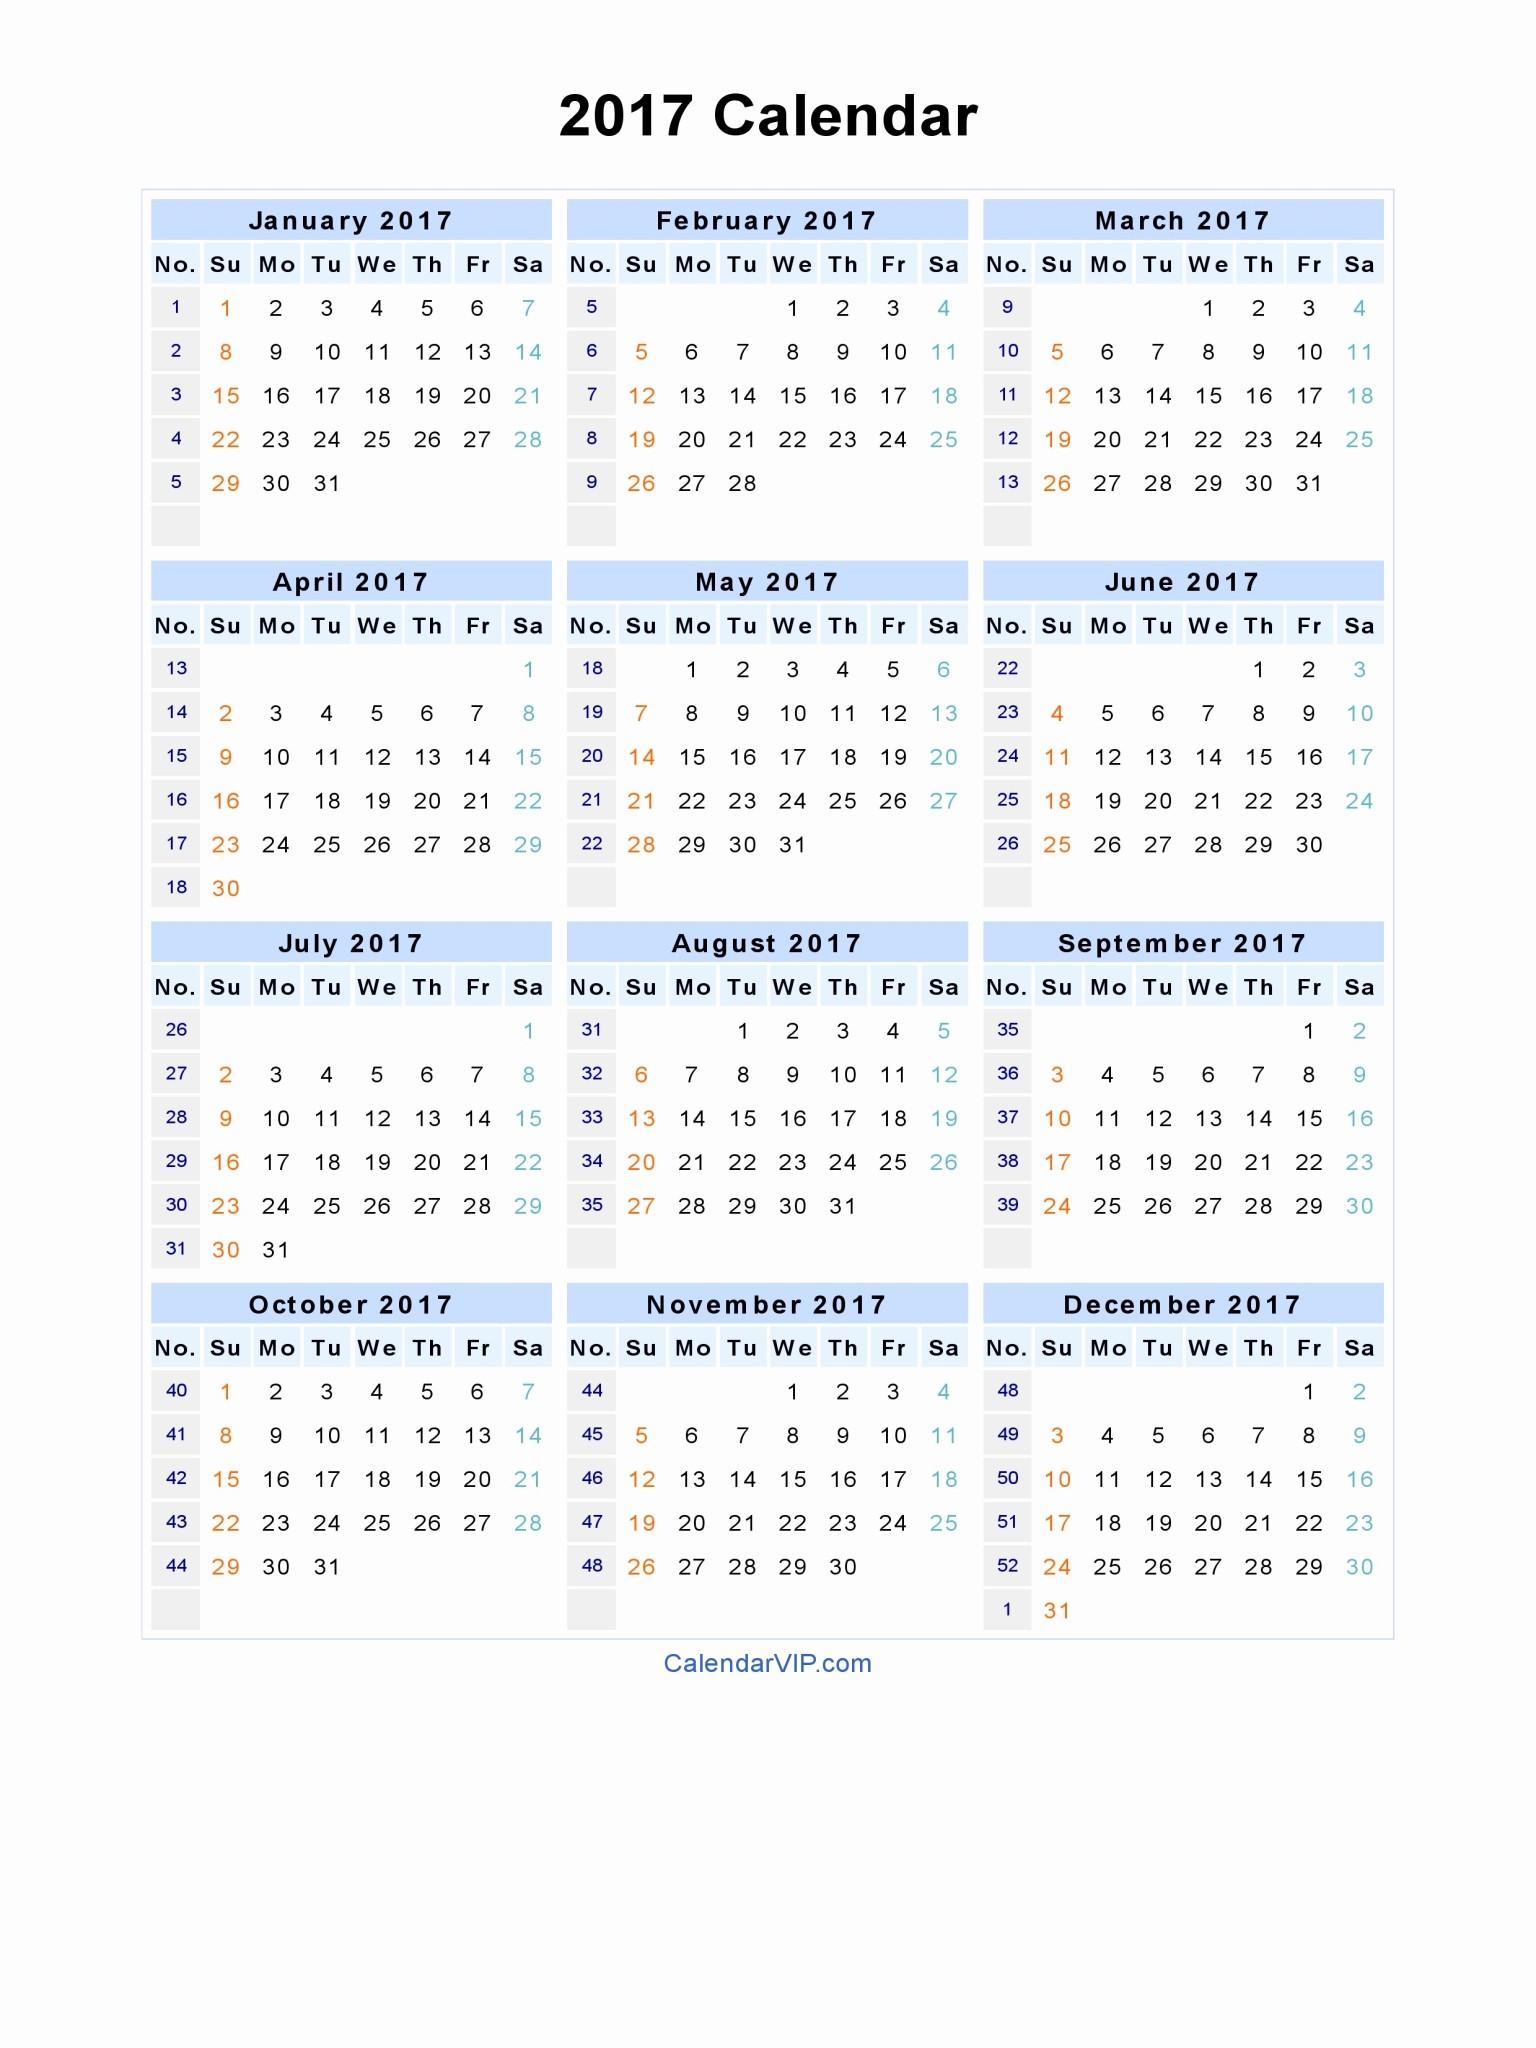 Free 2017 Printable Calendar Word Awesome 2017 Printable Calendar Word